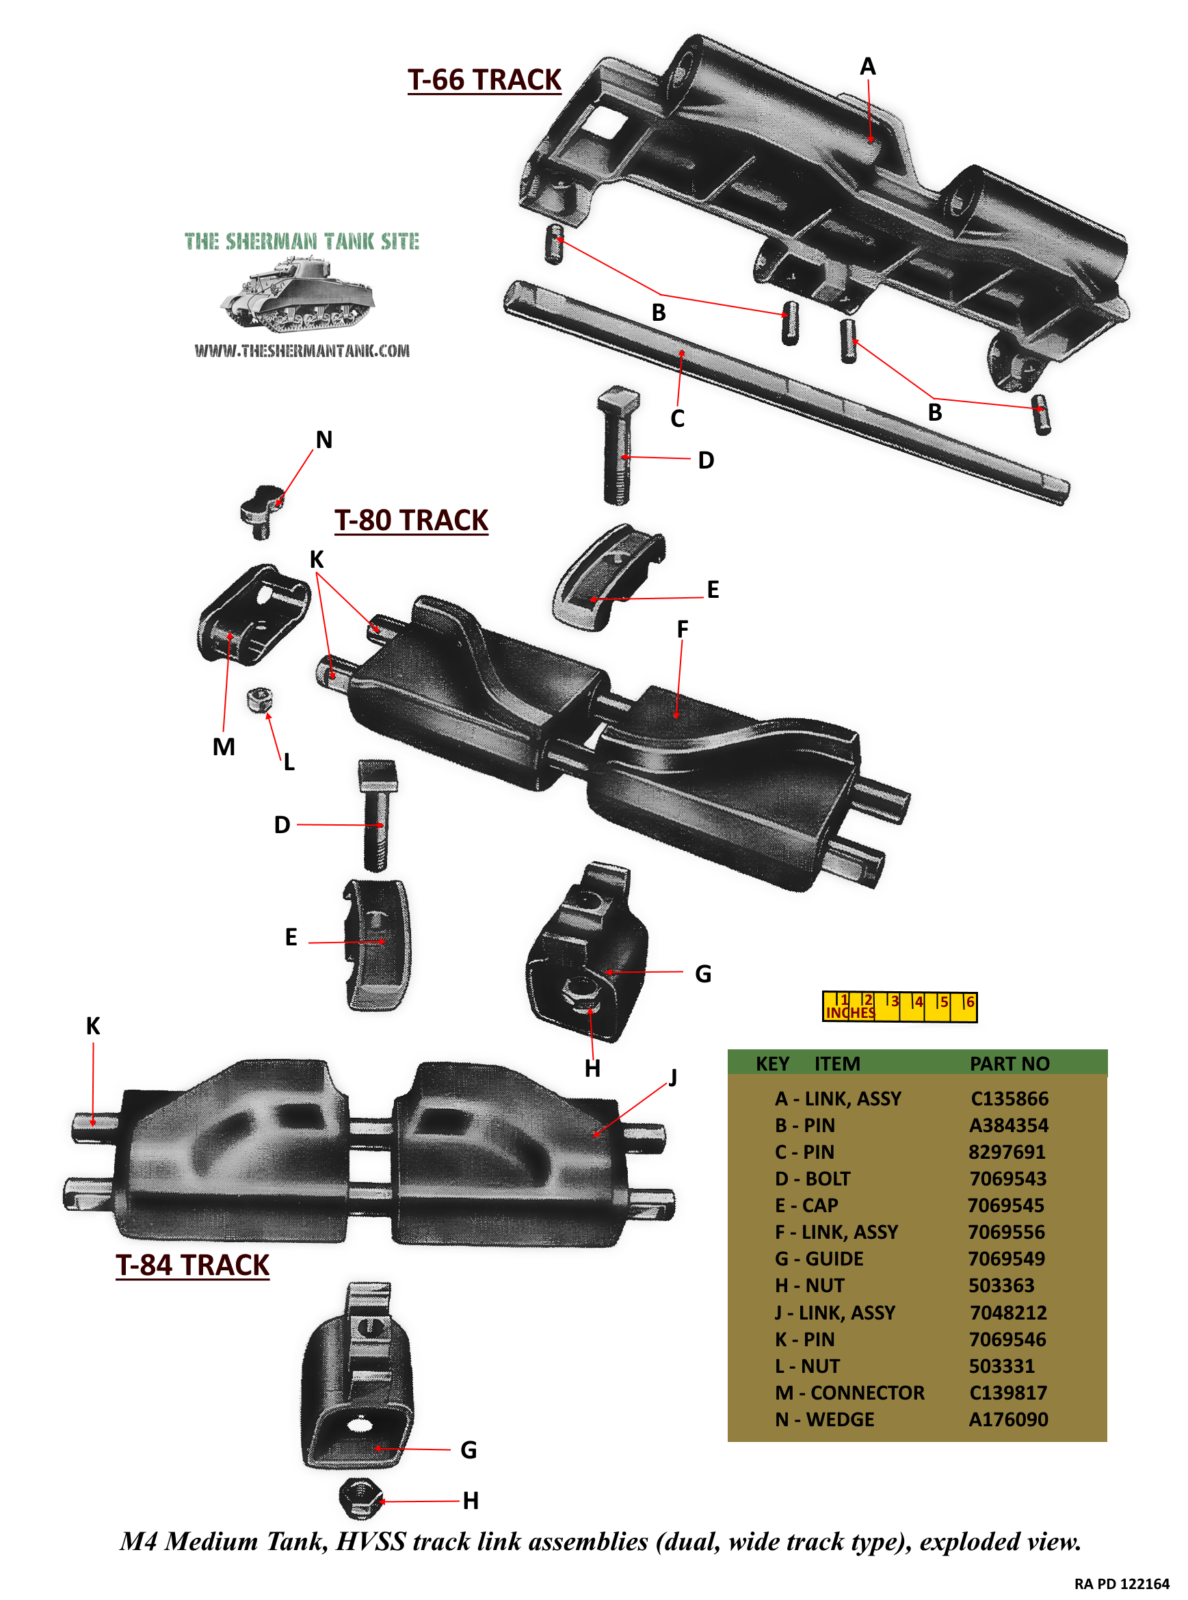 HVSS-Tracks-IMPROVEDII-FLATvv-1188x1600.